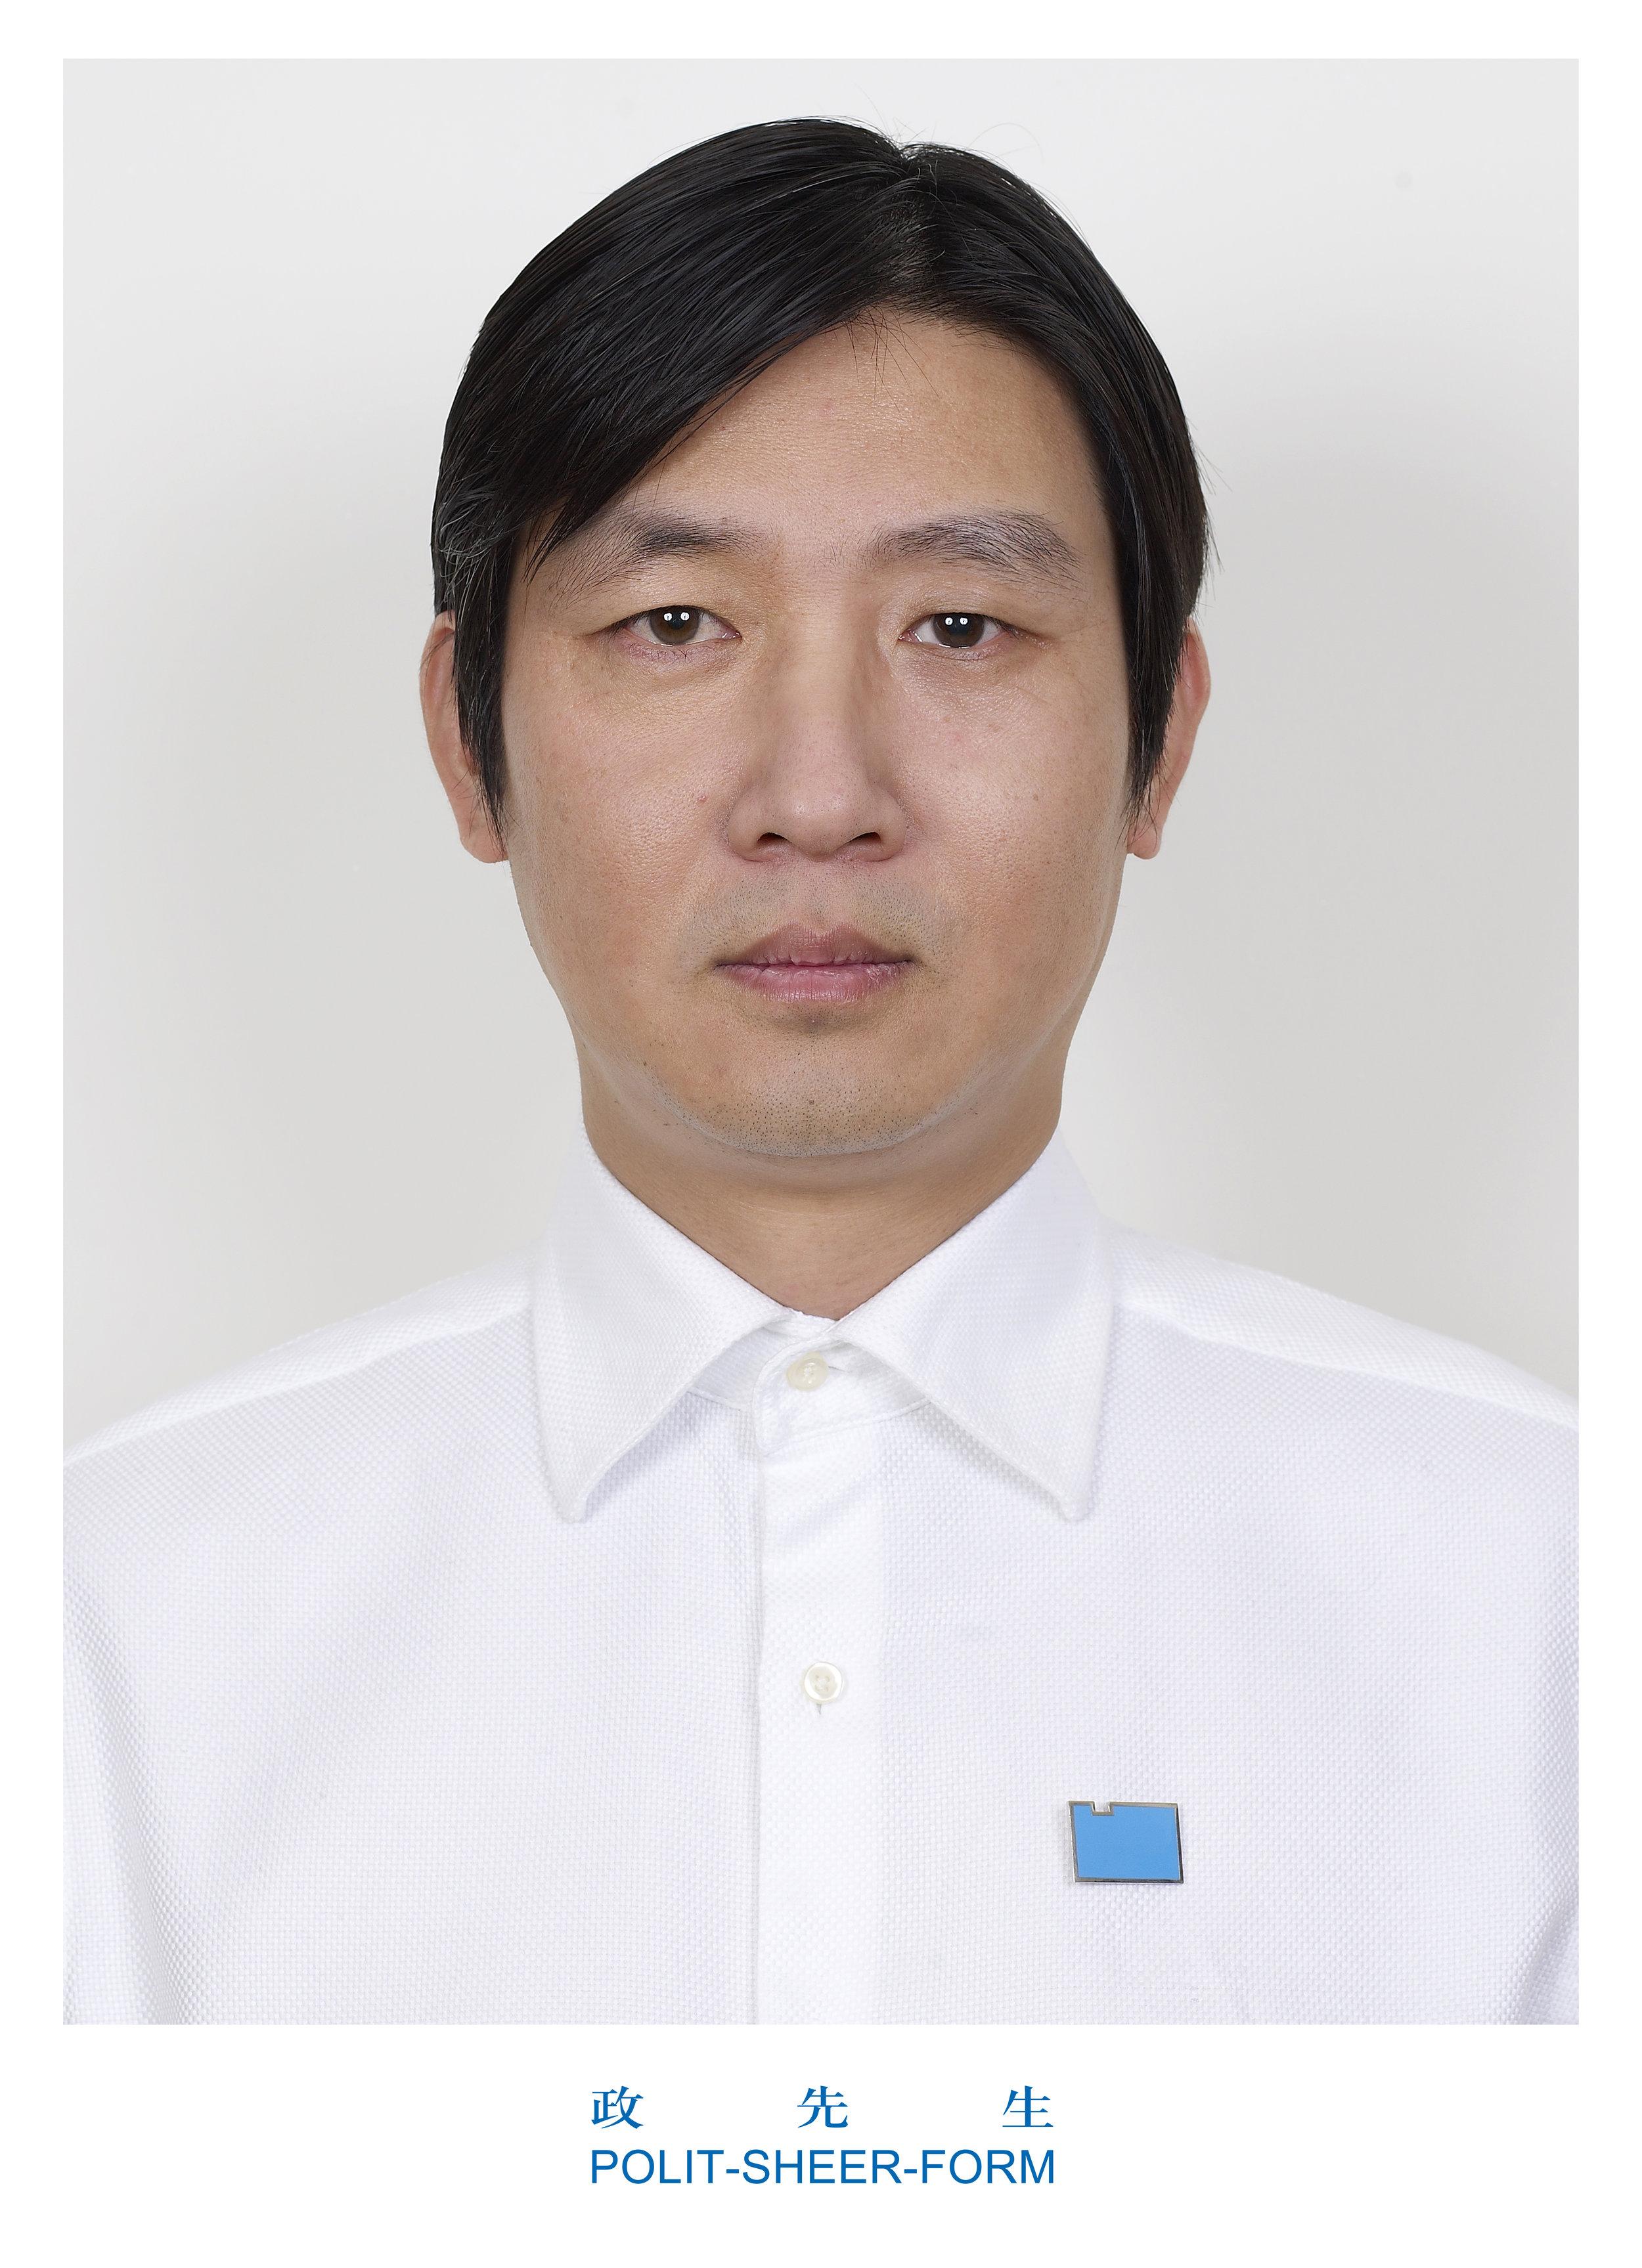 - Mr Zheng